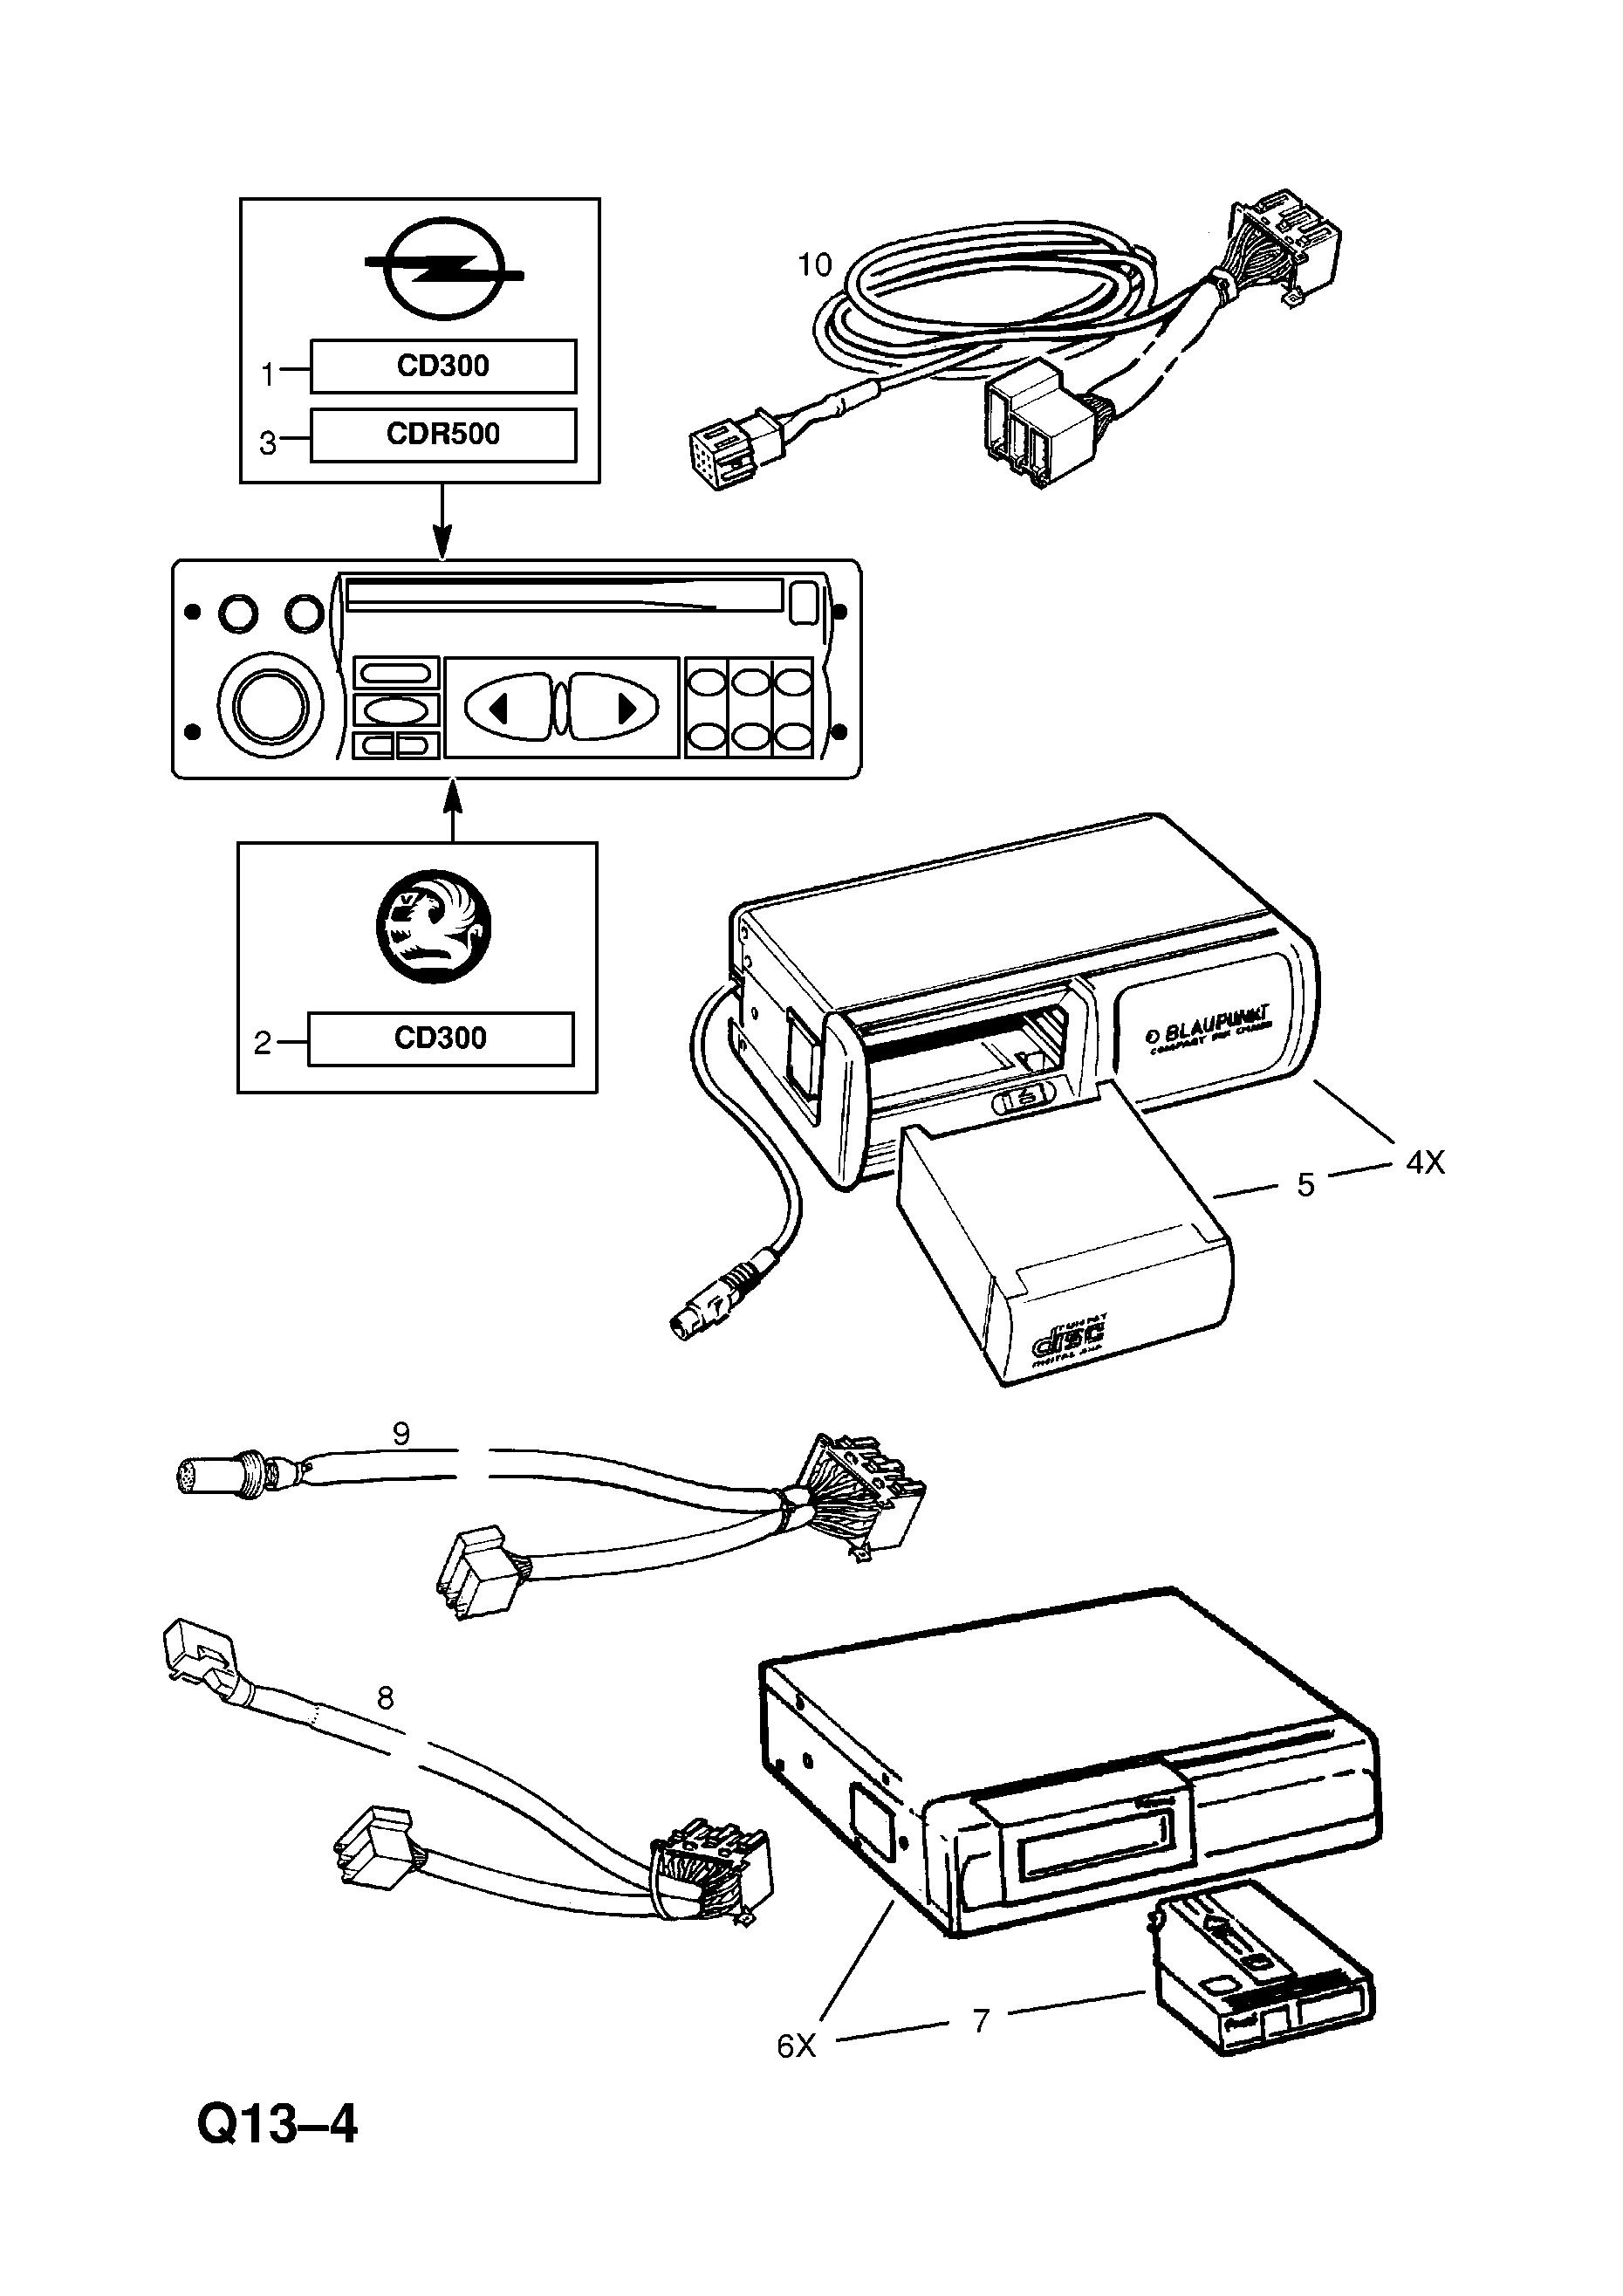 Dtsline PASSARUOTA tipo B 30mm 4x100 OPEL VECTRA A-AX CC